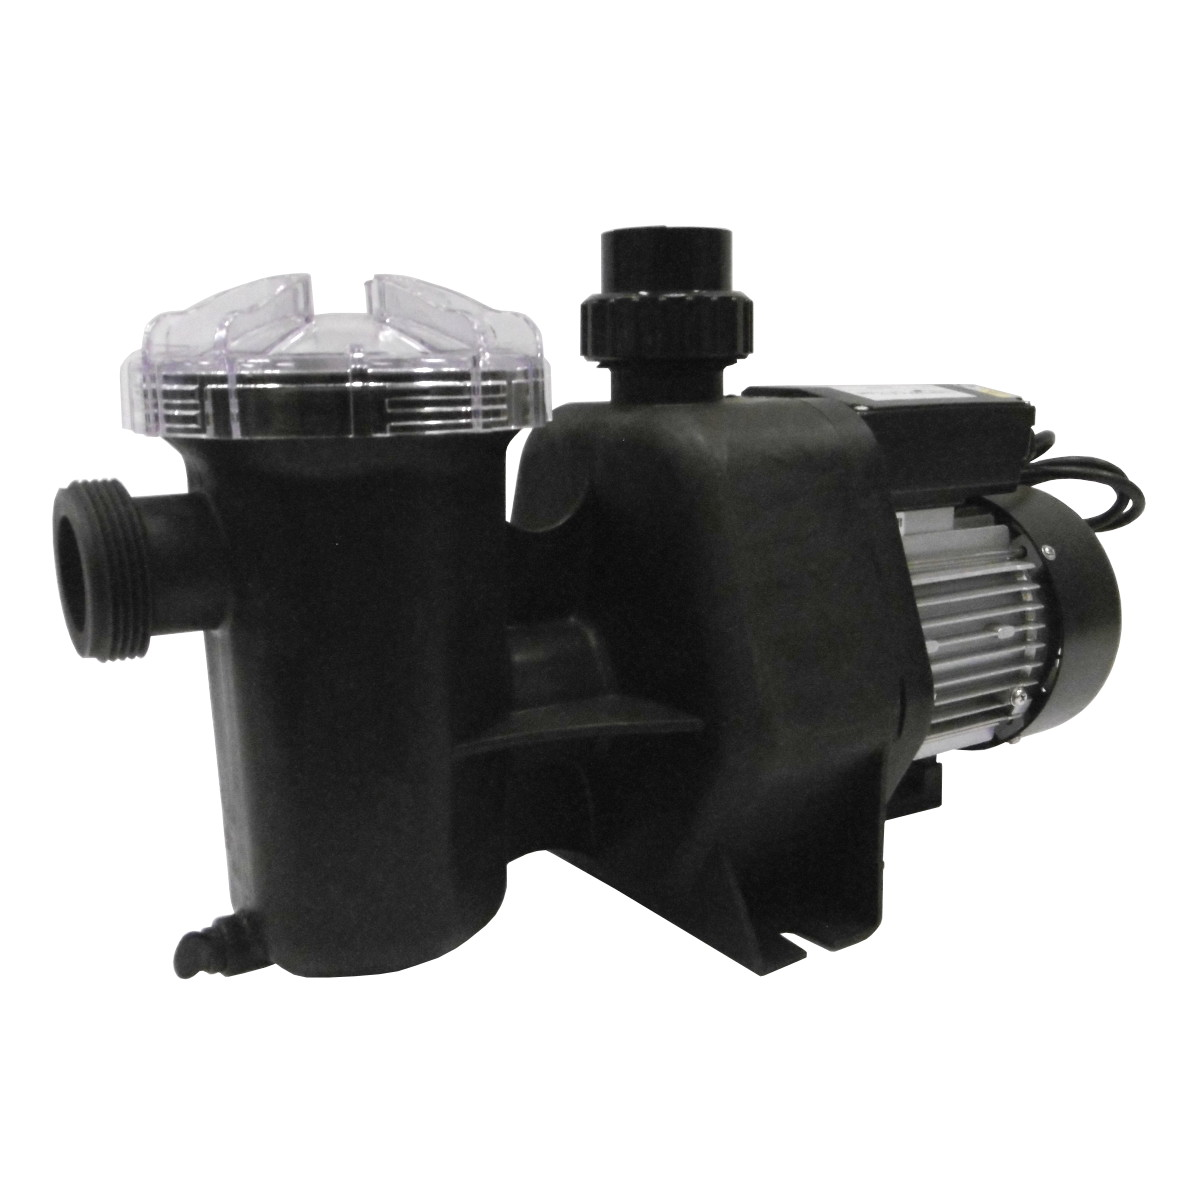 Pompe de filtration MCB 1 CV | L'EAU COST